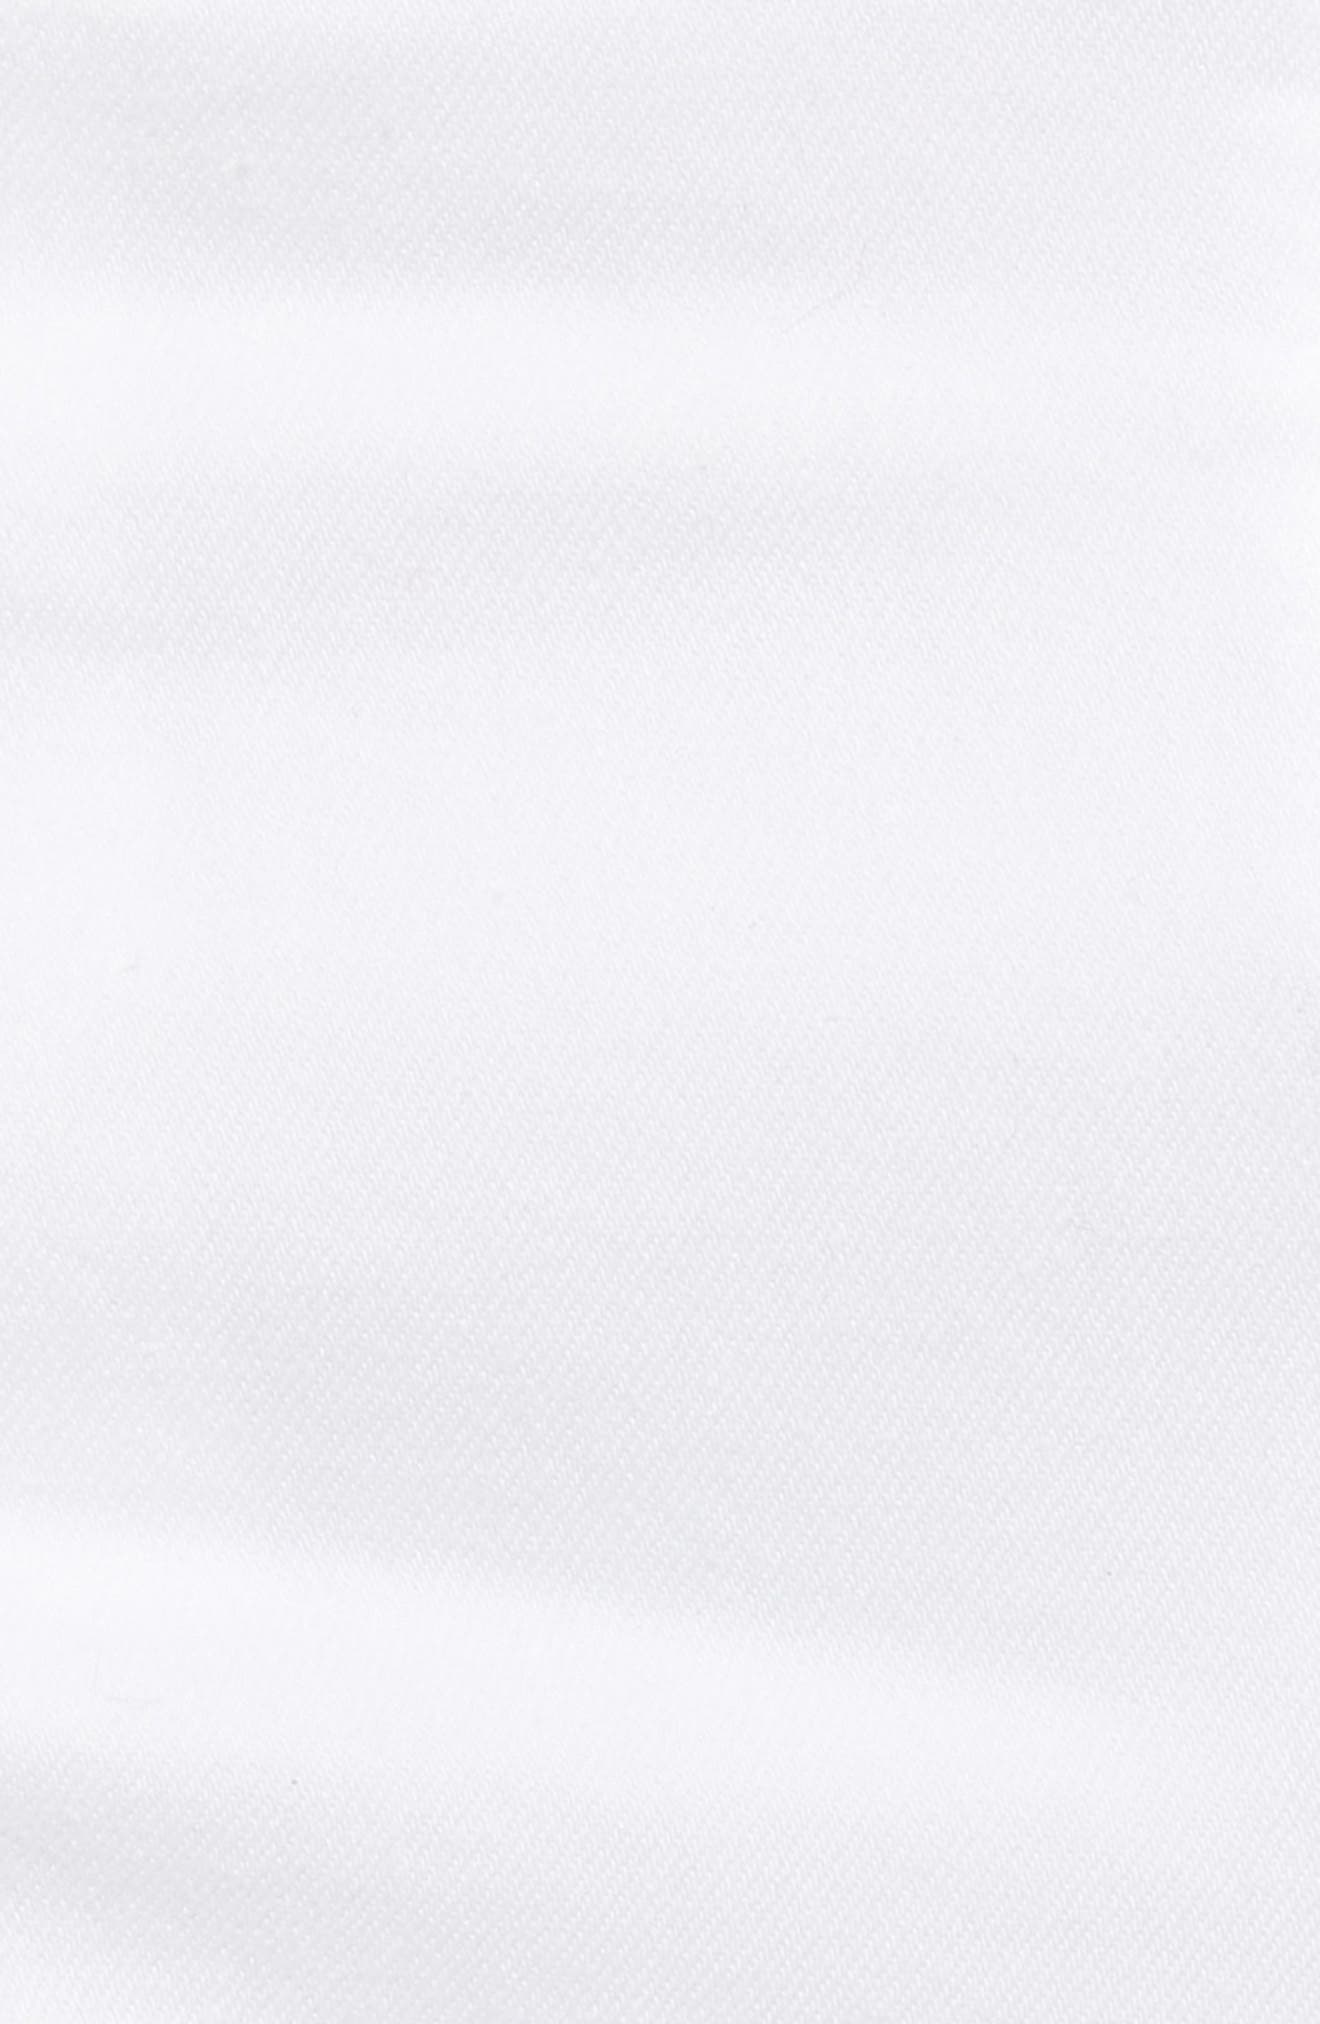 Ripped Cutoff Shorts,                             Alternate thumbnail 6, color,                             White